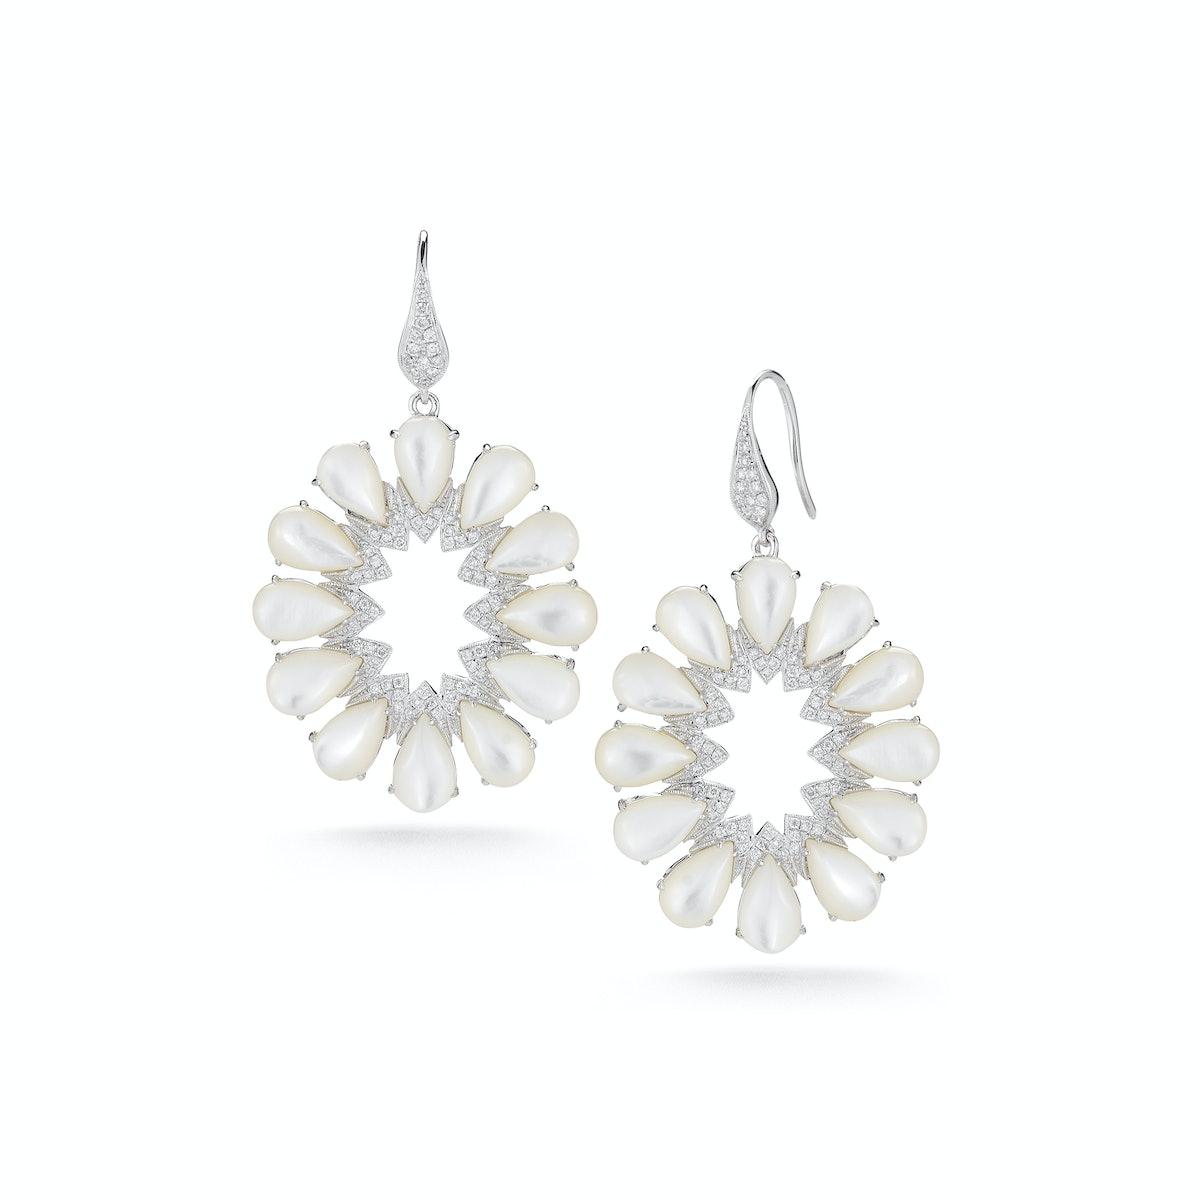 Dana Rebecca 14k white gold, mother of pearl, and diamond earrings